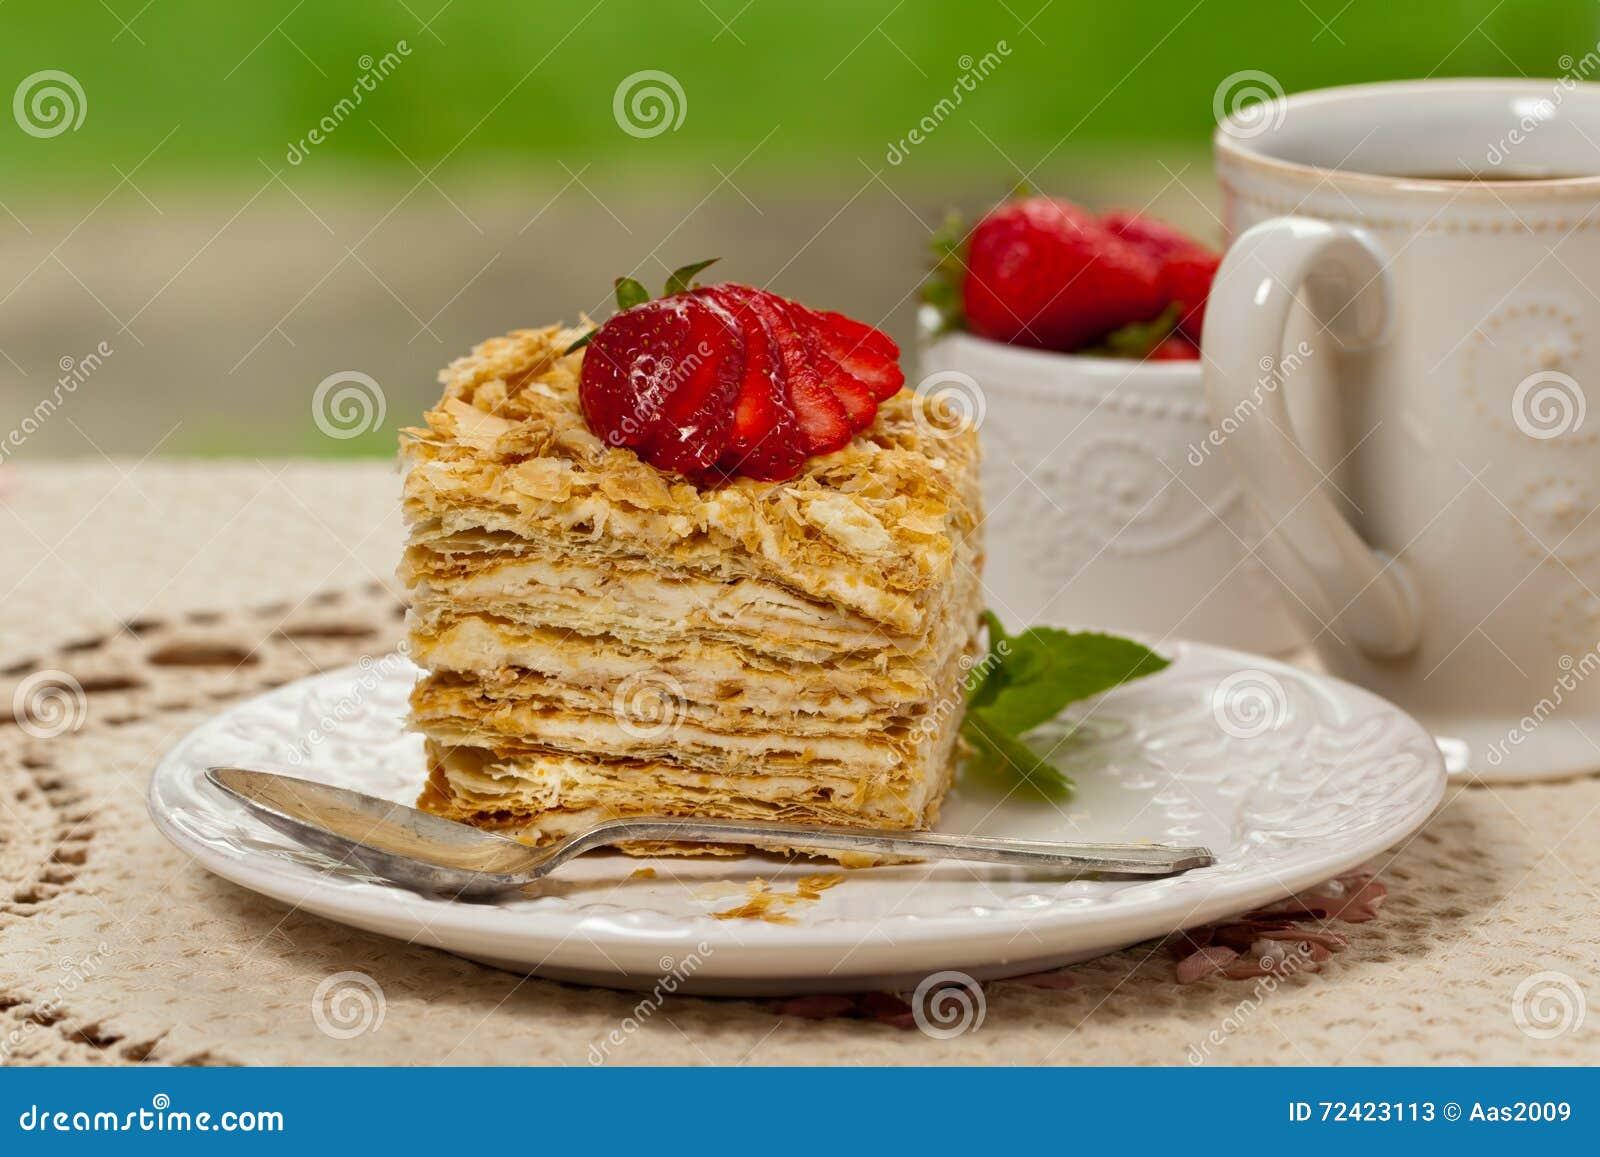 Blatterteig Napoleon Cake Stockbild Bild Von Vanillepudding 72423113